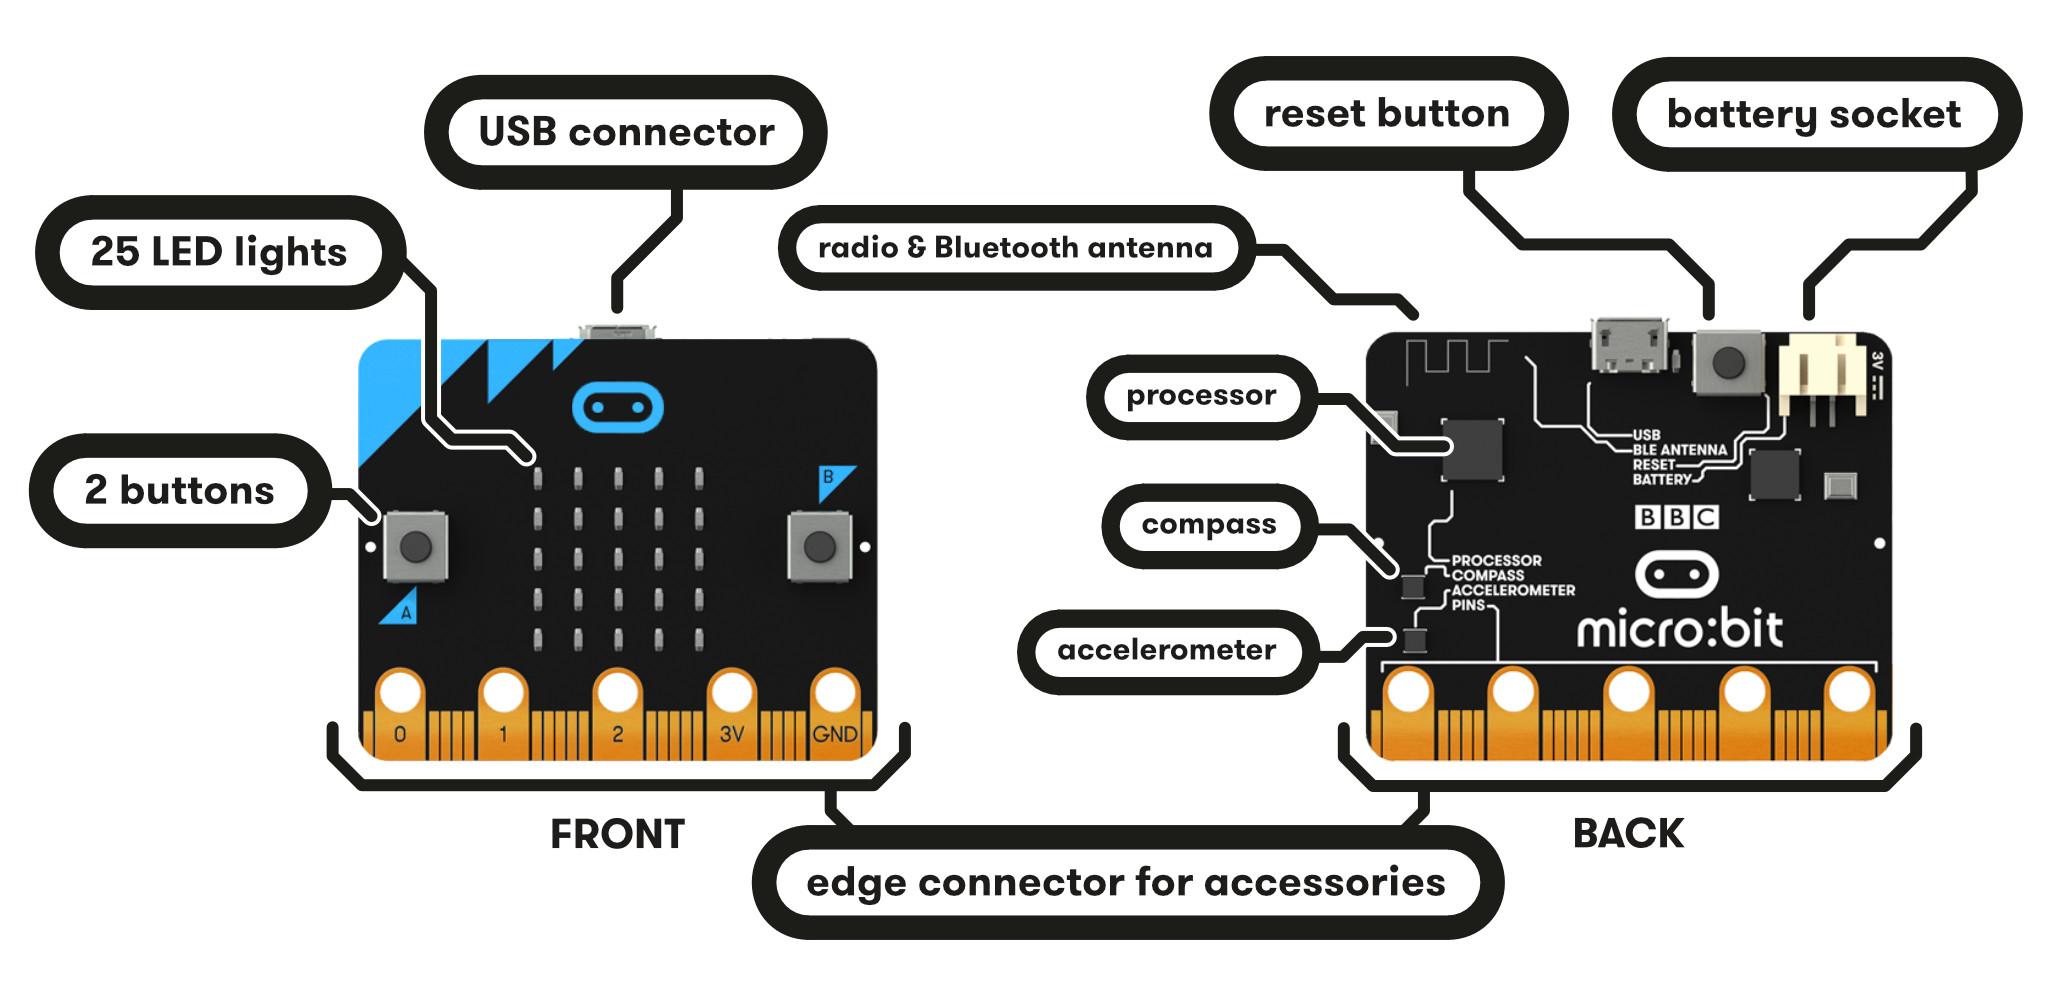 Micro:bit的硬件资源--图片来自于microbit.org